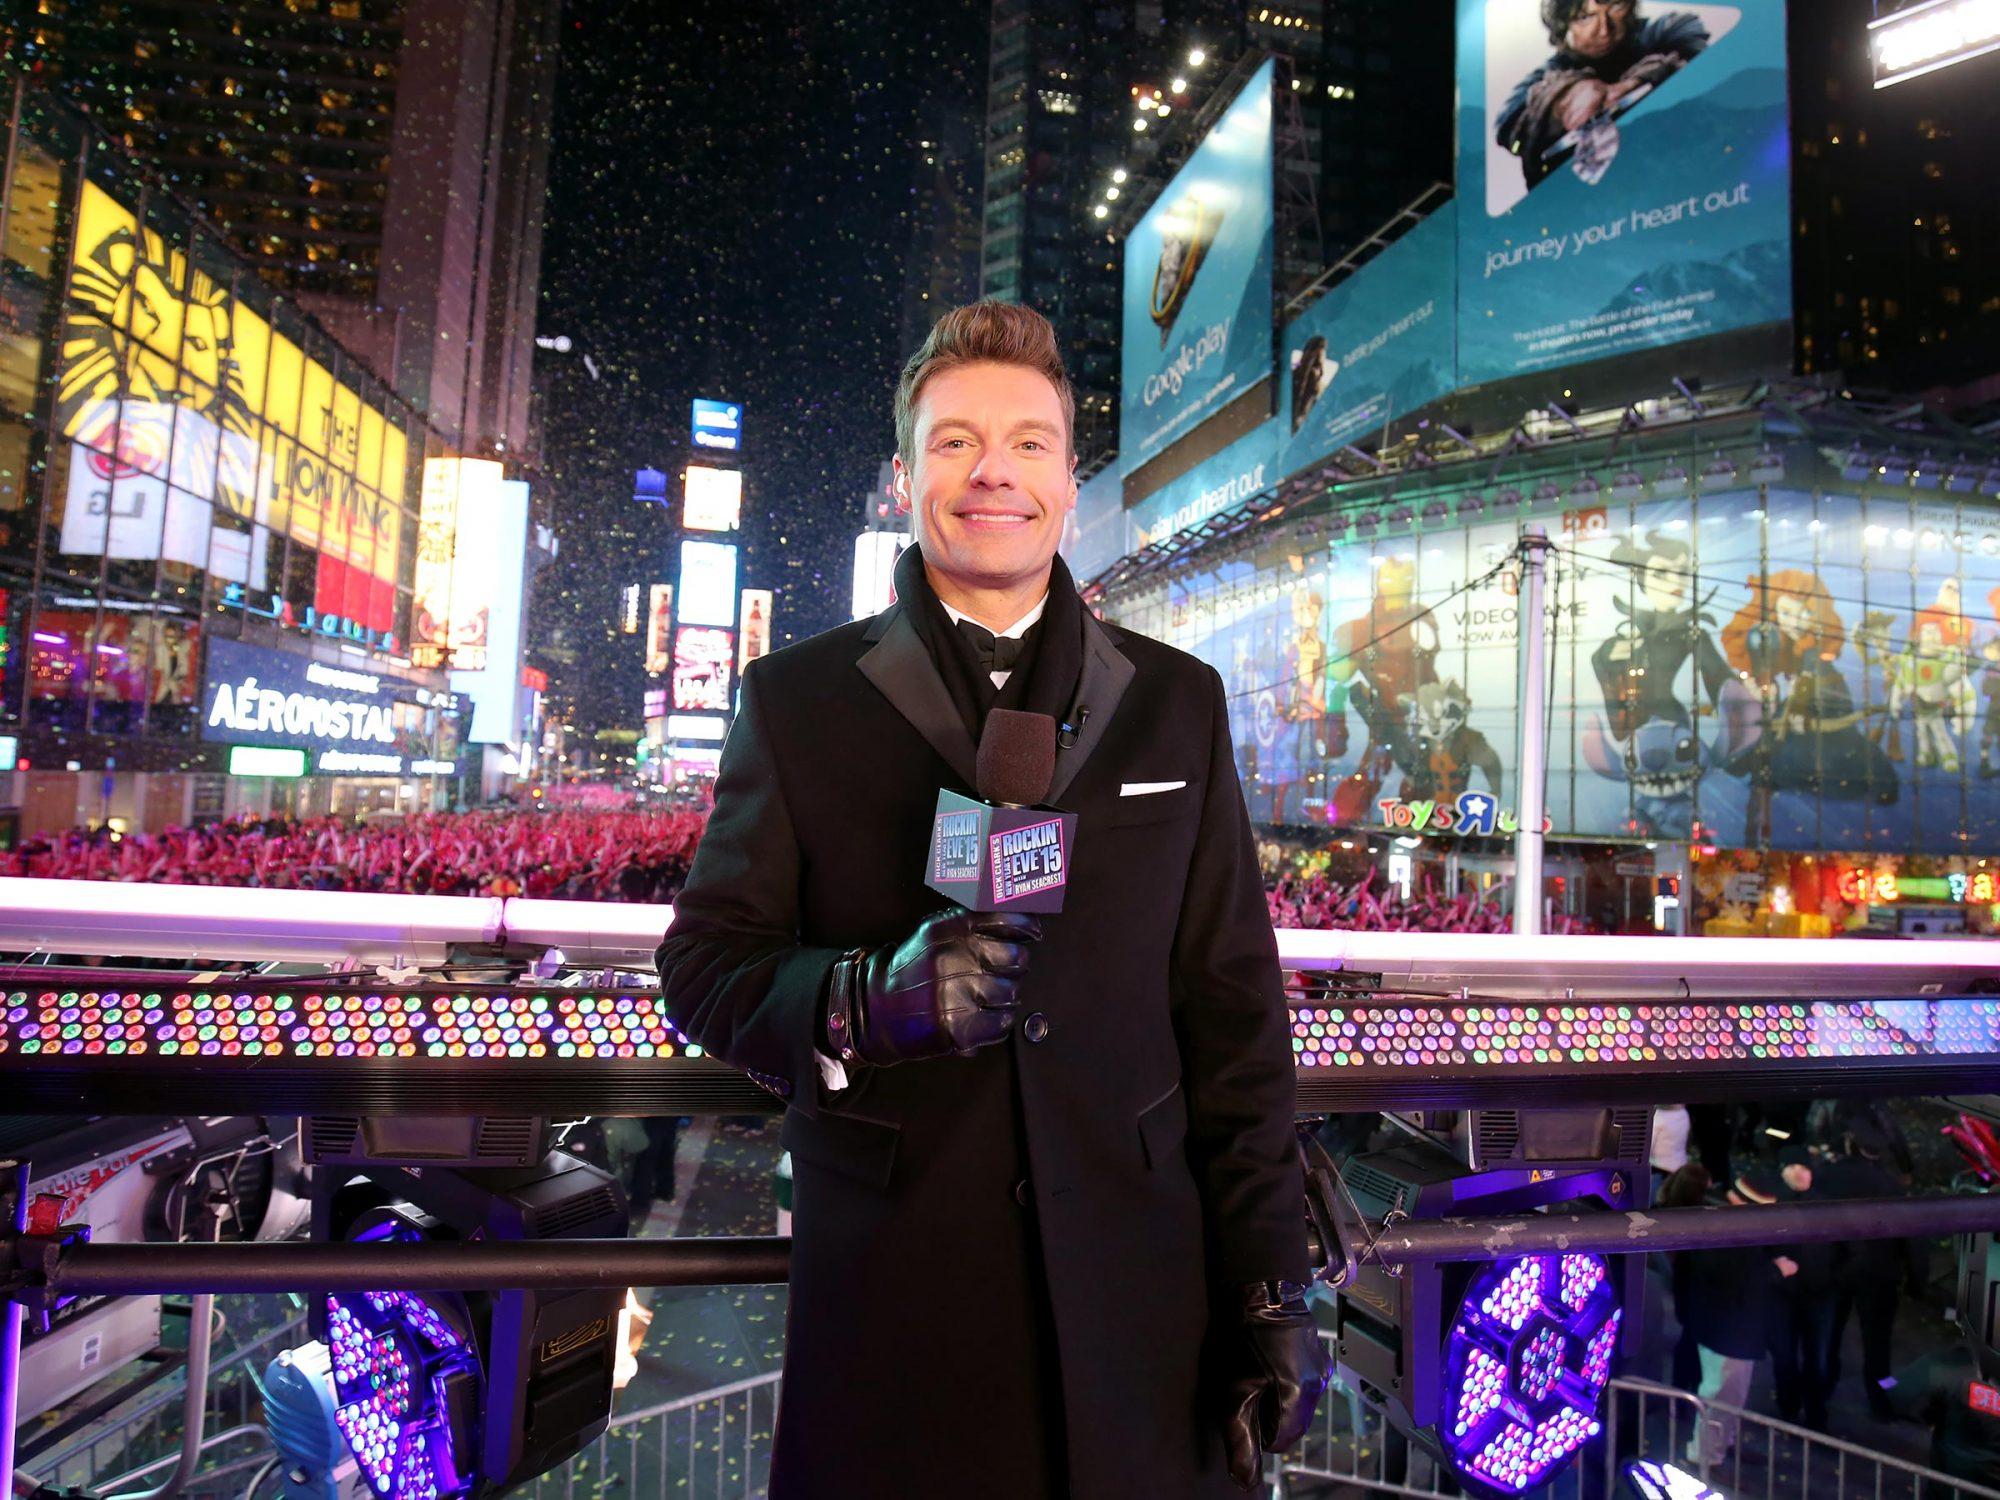 Dick Clark's New Year's Rockin' Eve With Ryan Seacrest 2015